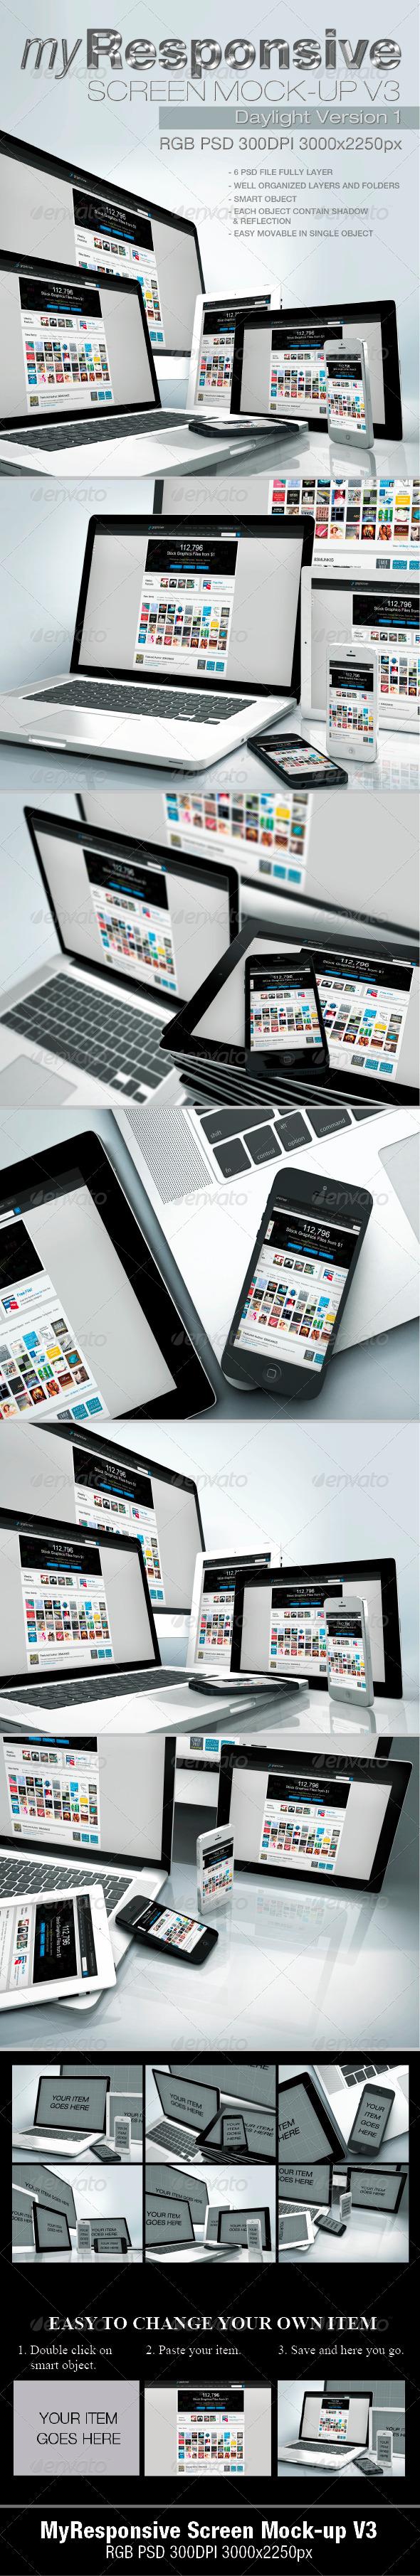 GraphicRiver myResponsive Screen Mock-Ups v3 4825480